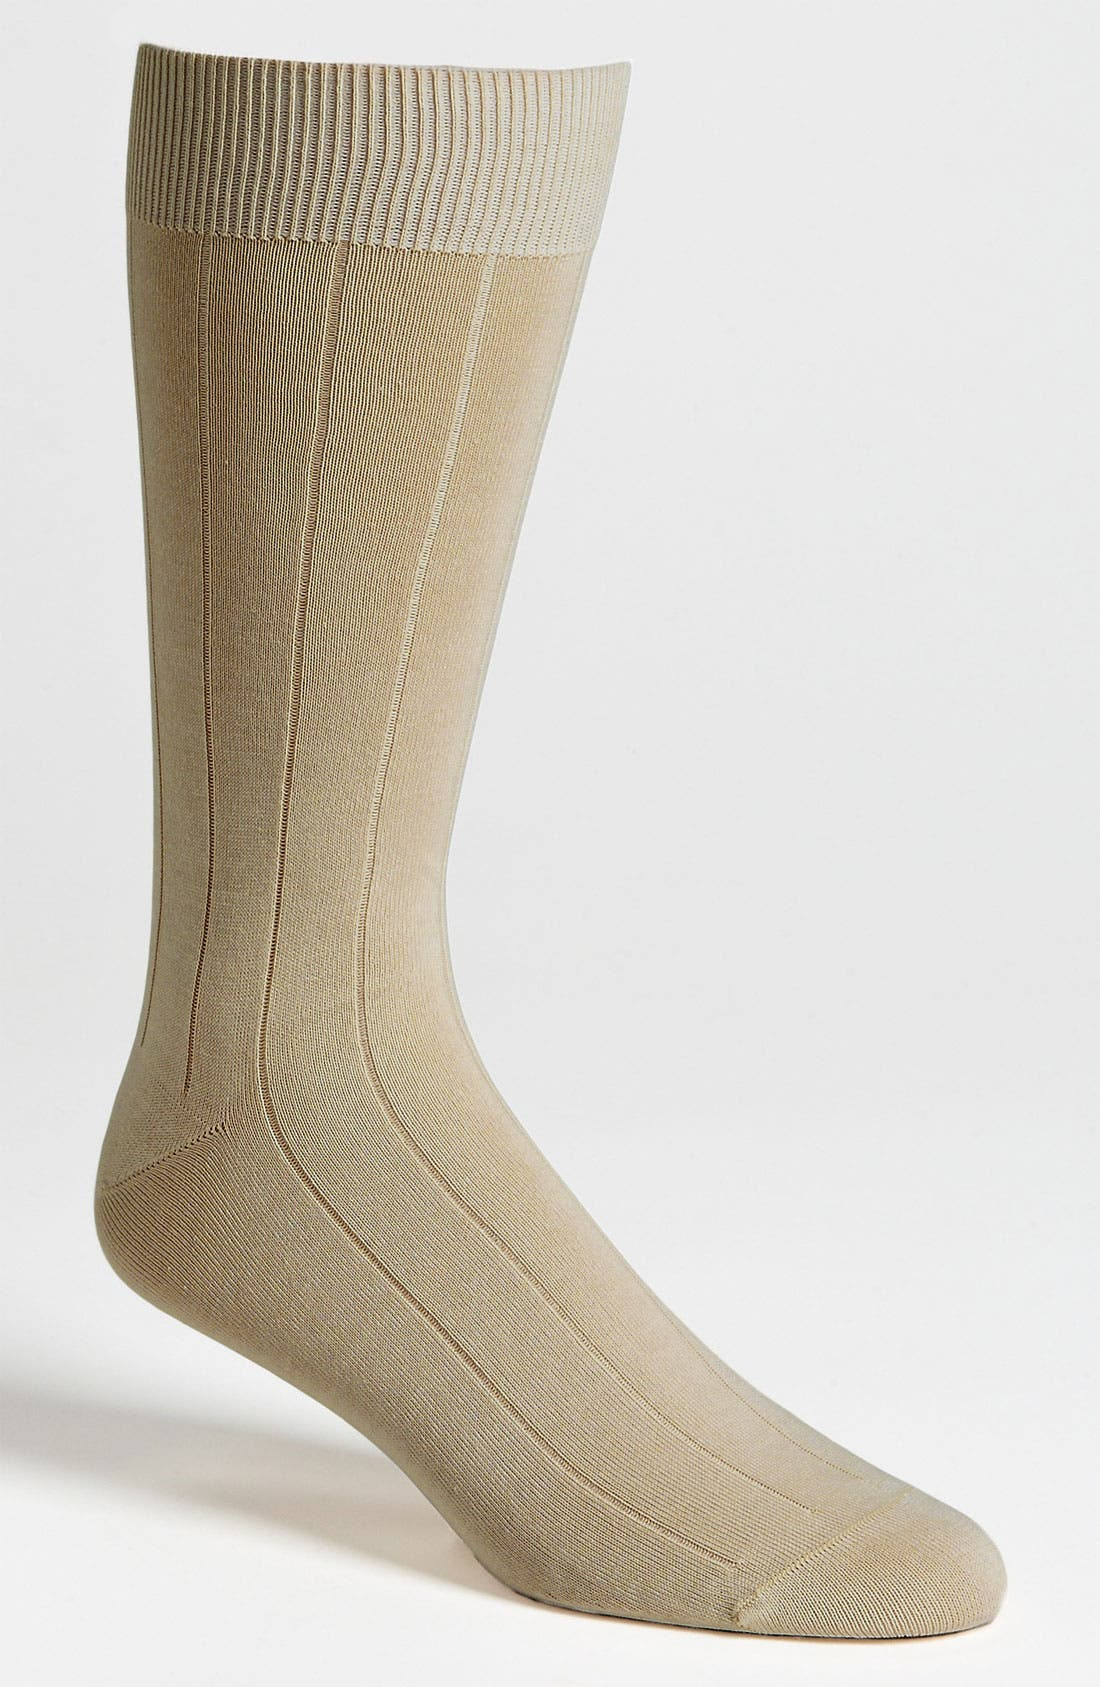 Main Image - Pantherella Sea Island Cotton Socks